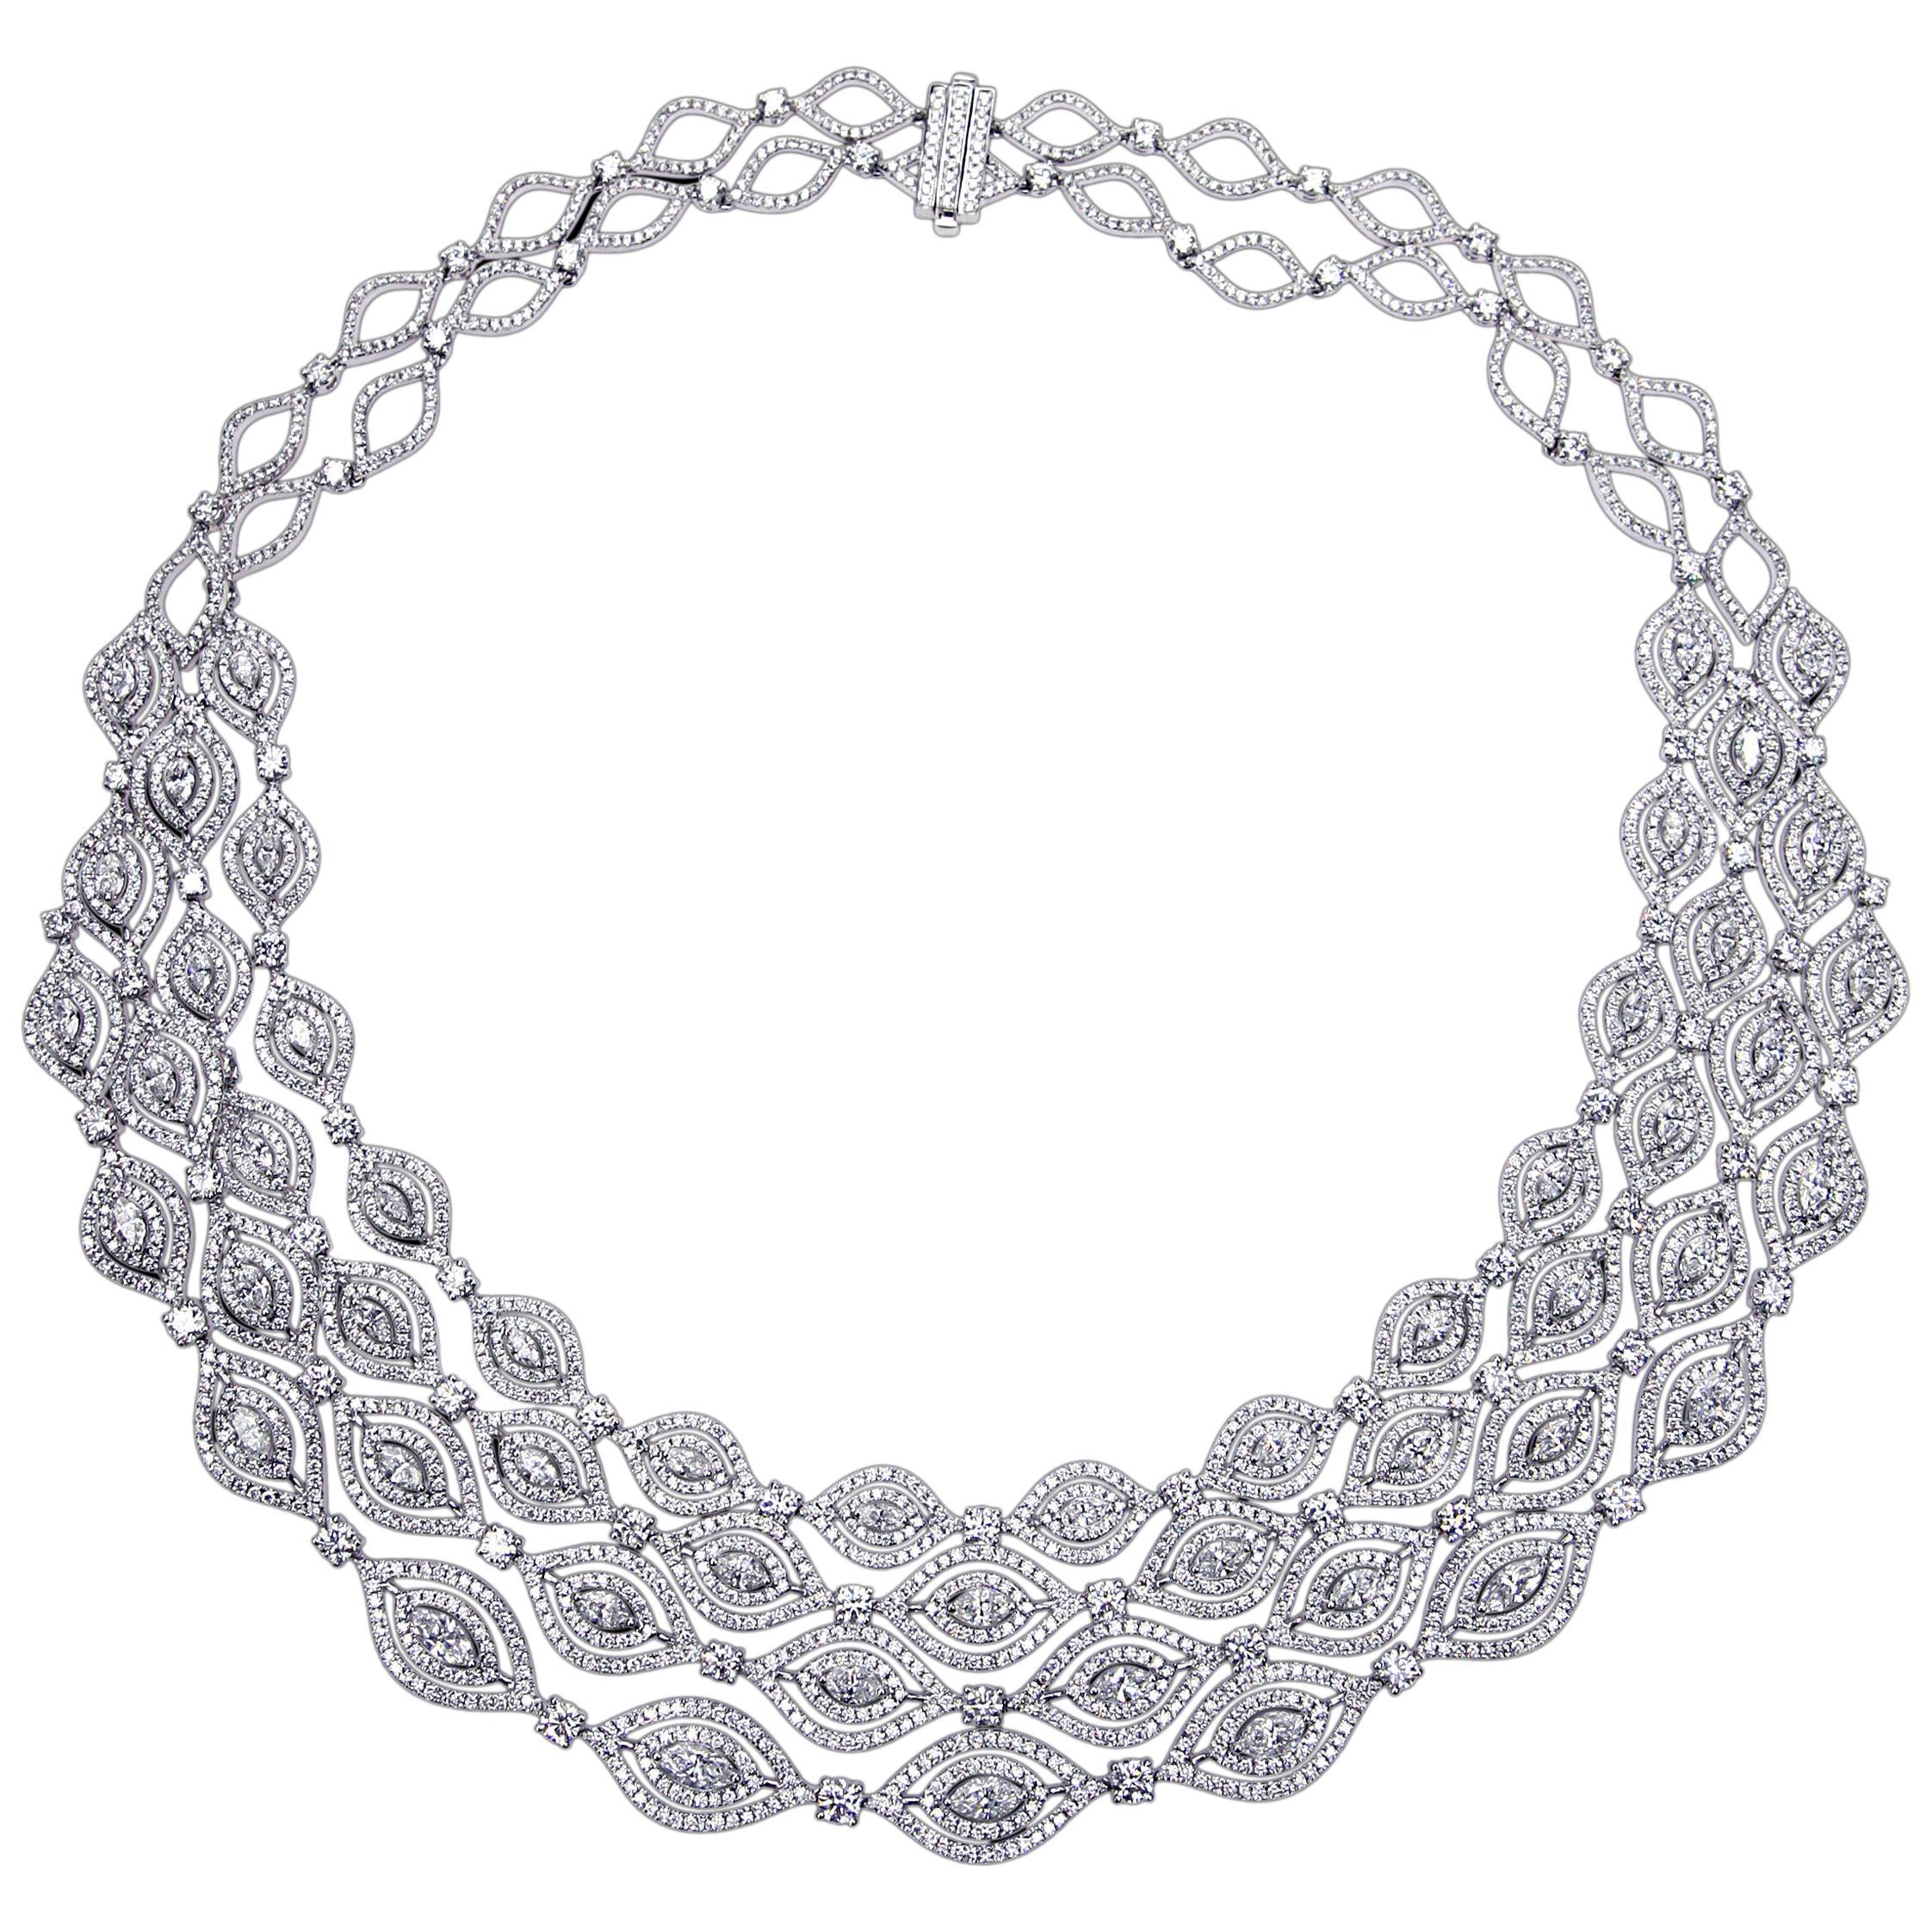 Magnificent 18 Karat Gold and Diamond Necklace